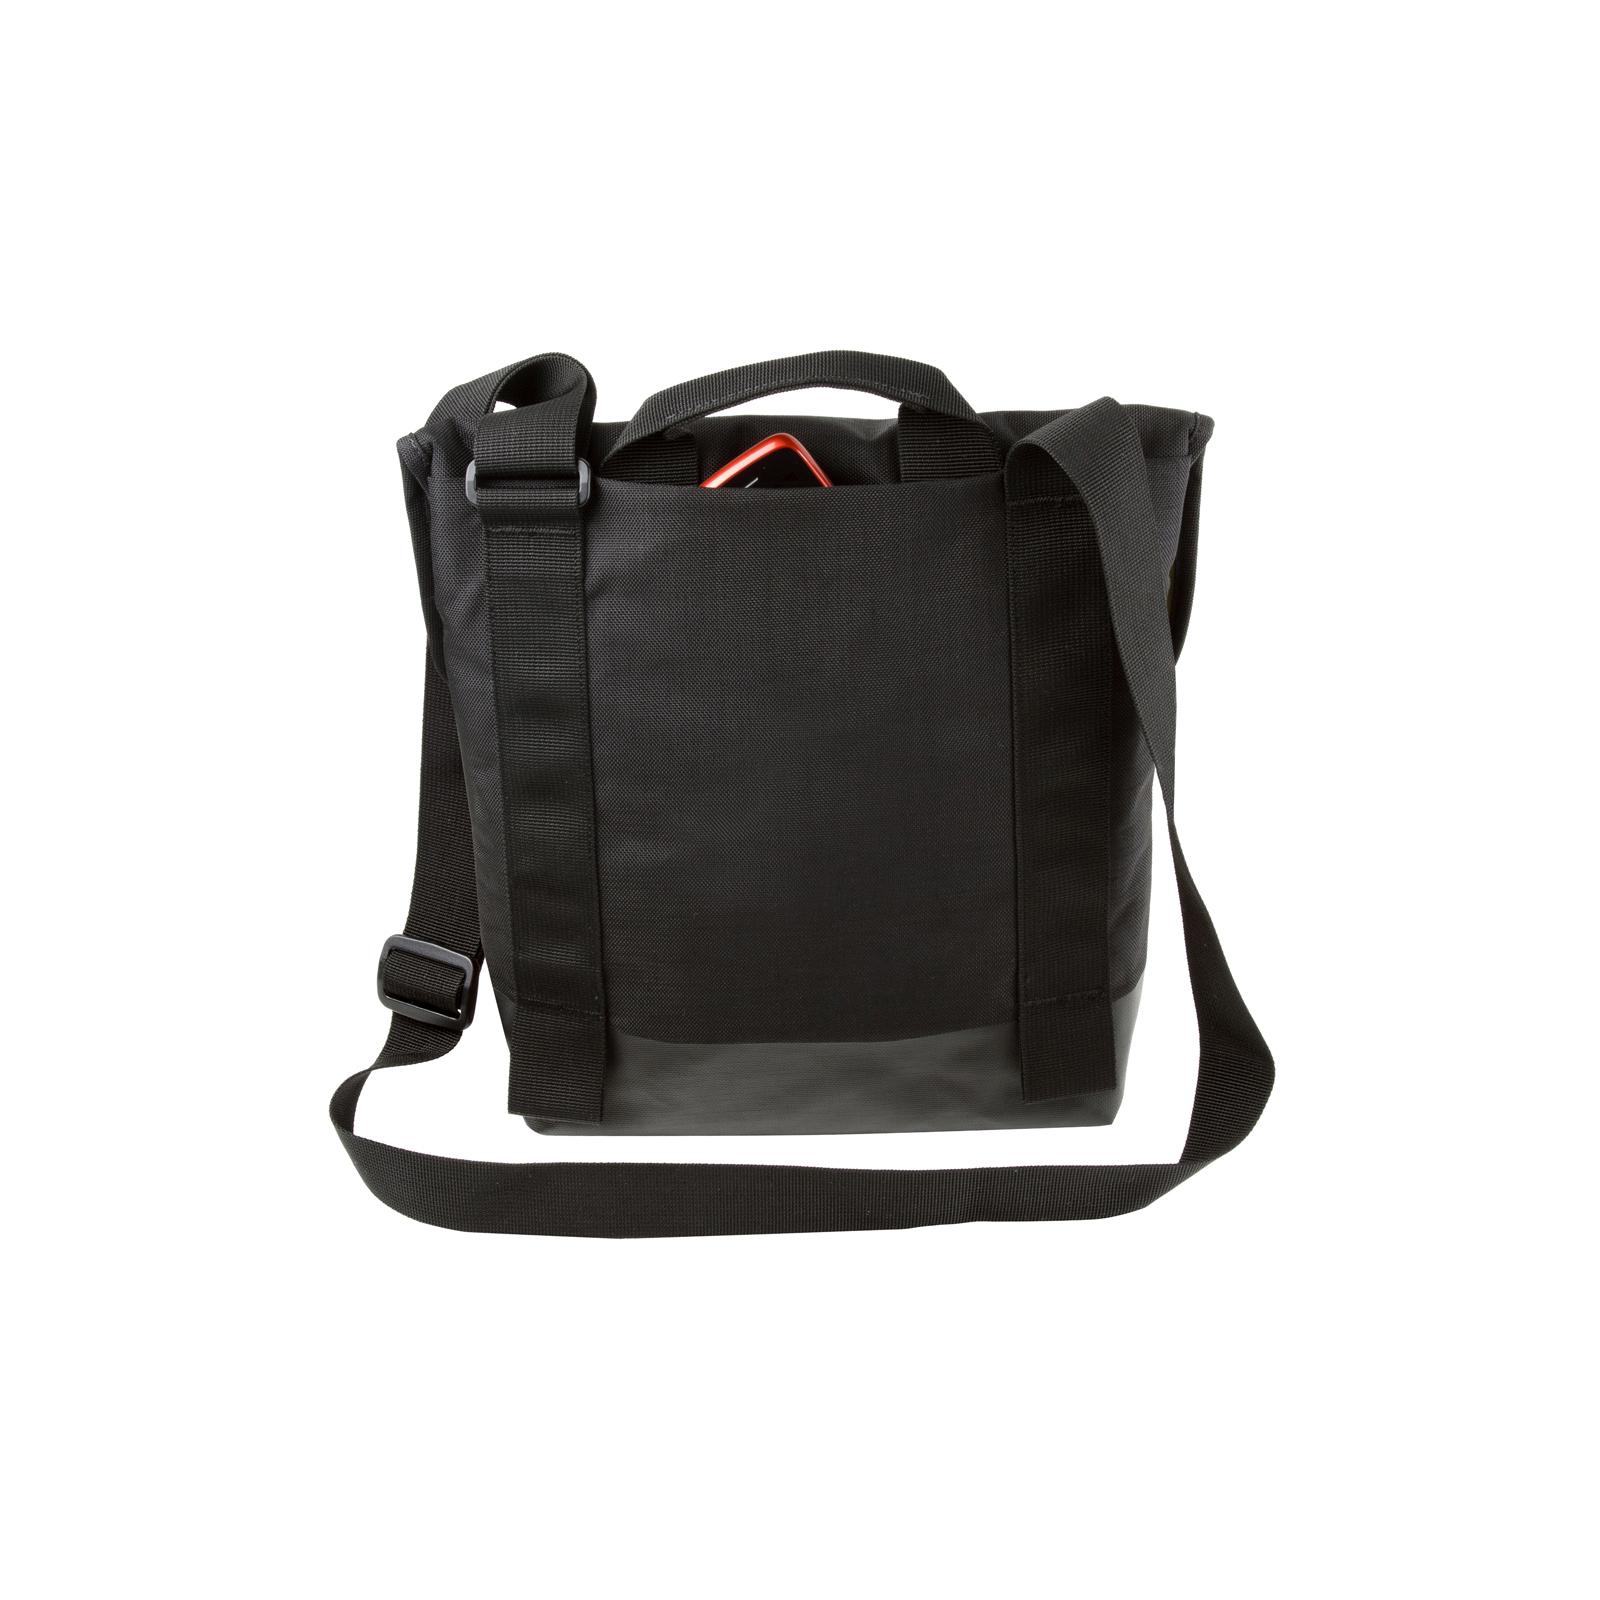 Чехол для планшета Crumpler 9 Private Surprise Sling Tablet/black-black (PSST-001) изображение 3